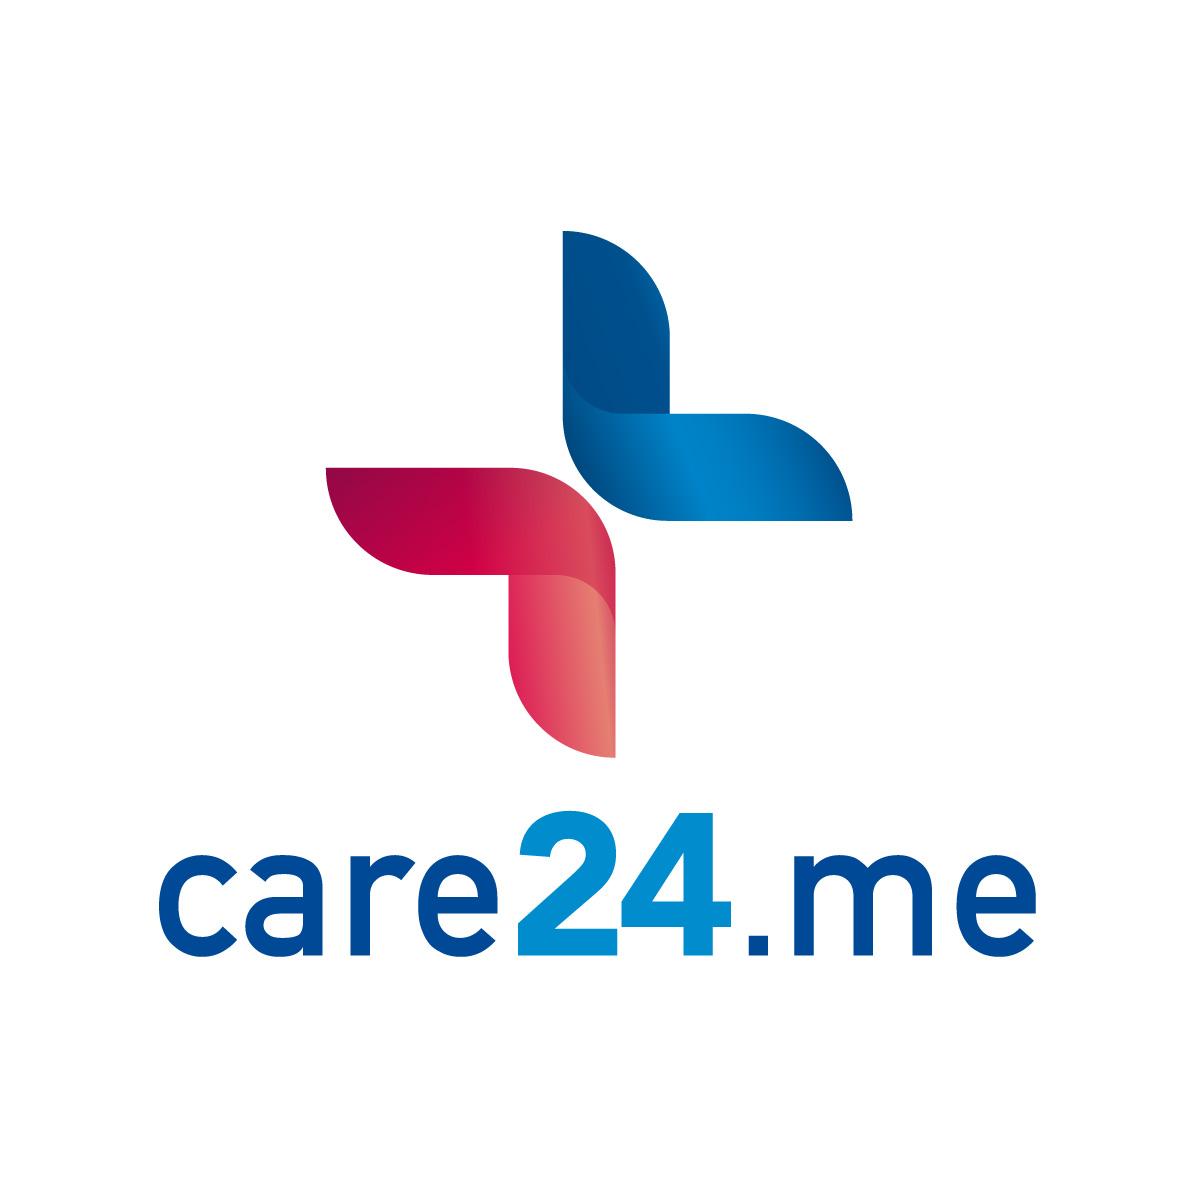 care24.me logo